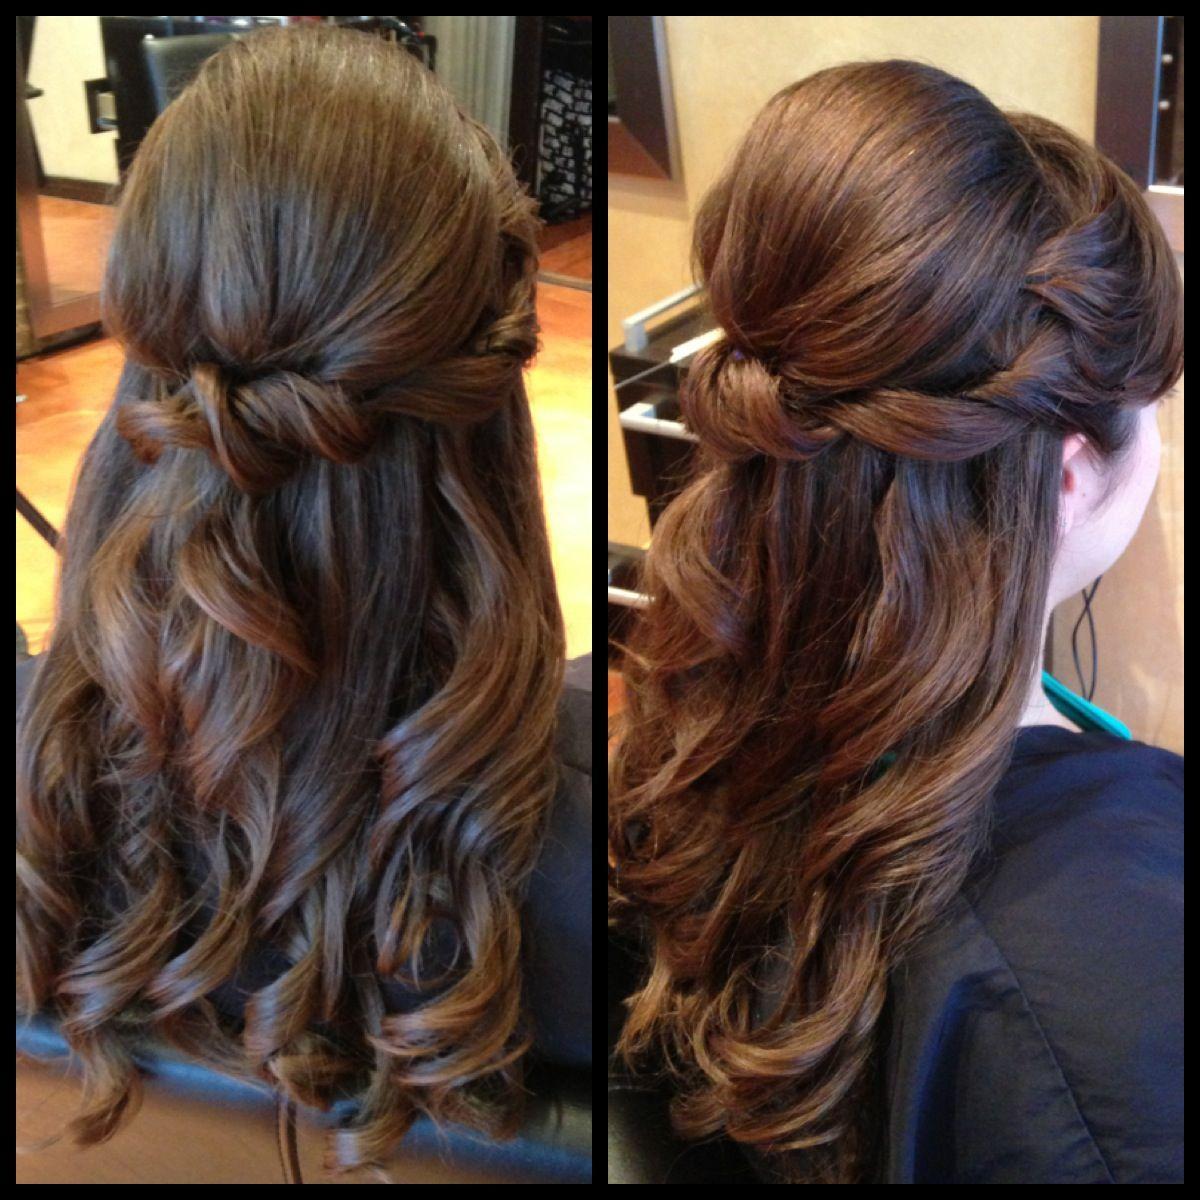 1 2 Updo Prom Hair Wedding Hair Bride Hair Styles Bridesmaid